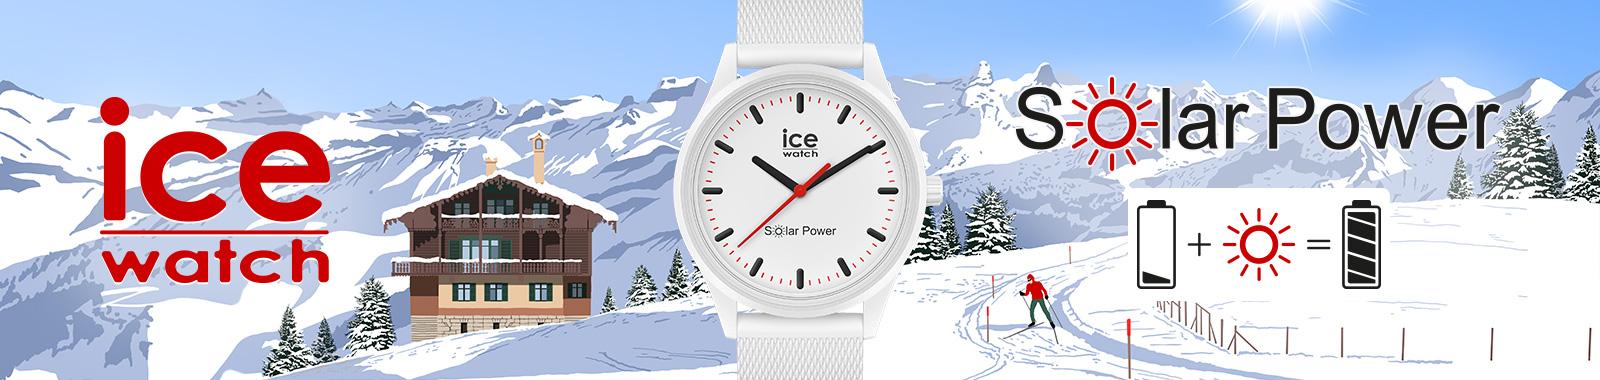 Ice Watch Banner